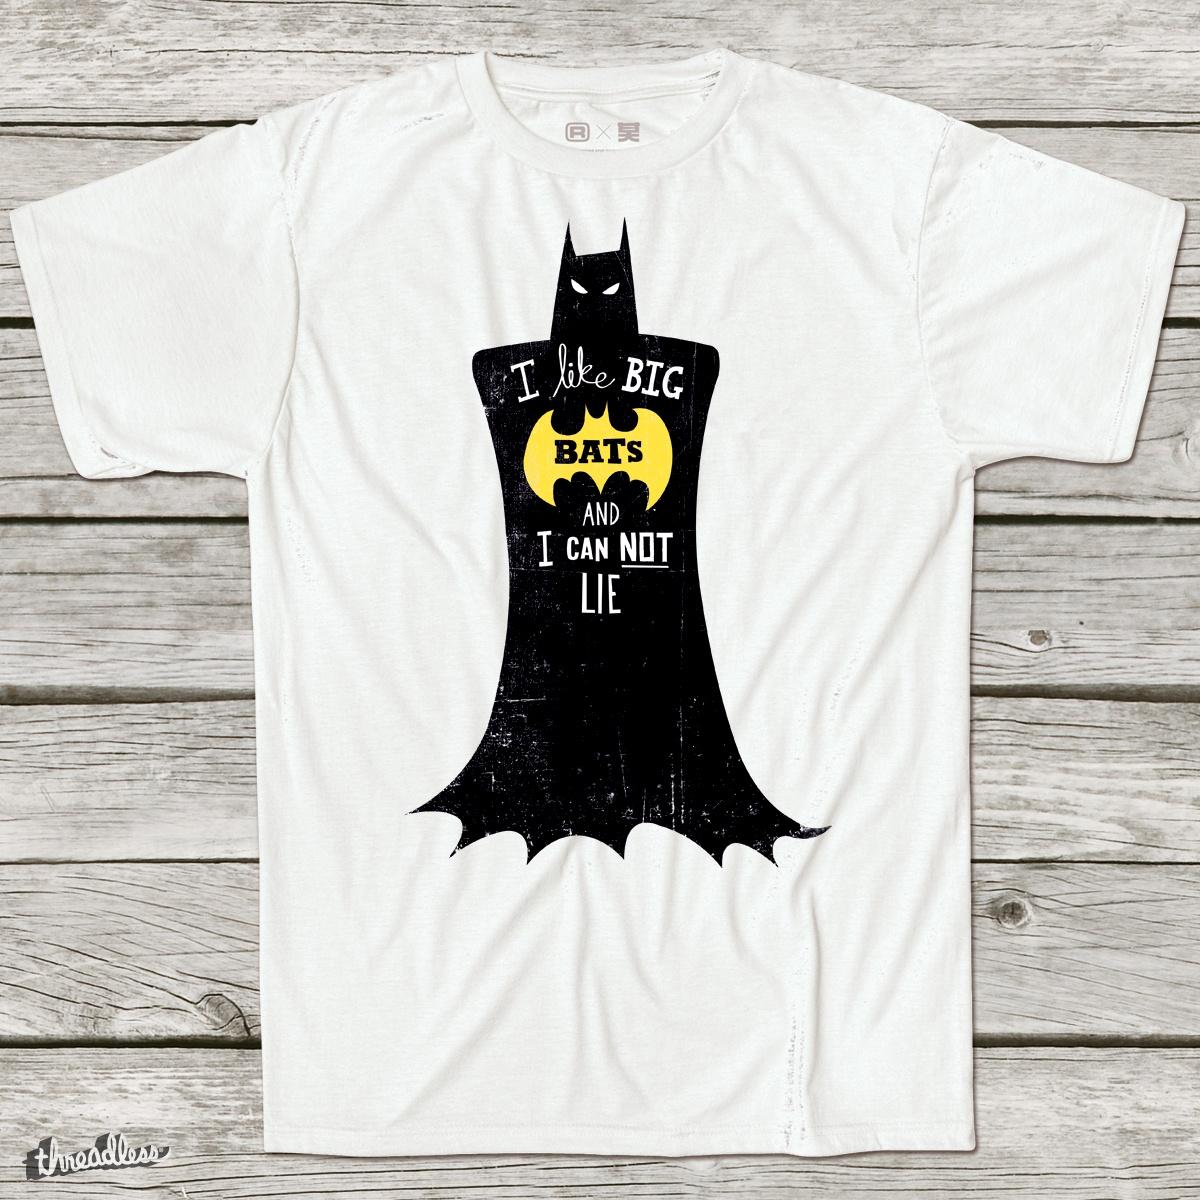 I Like Big Bats by DinoMike on Threadless